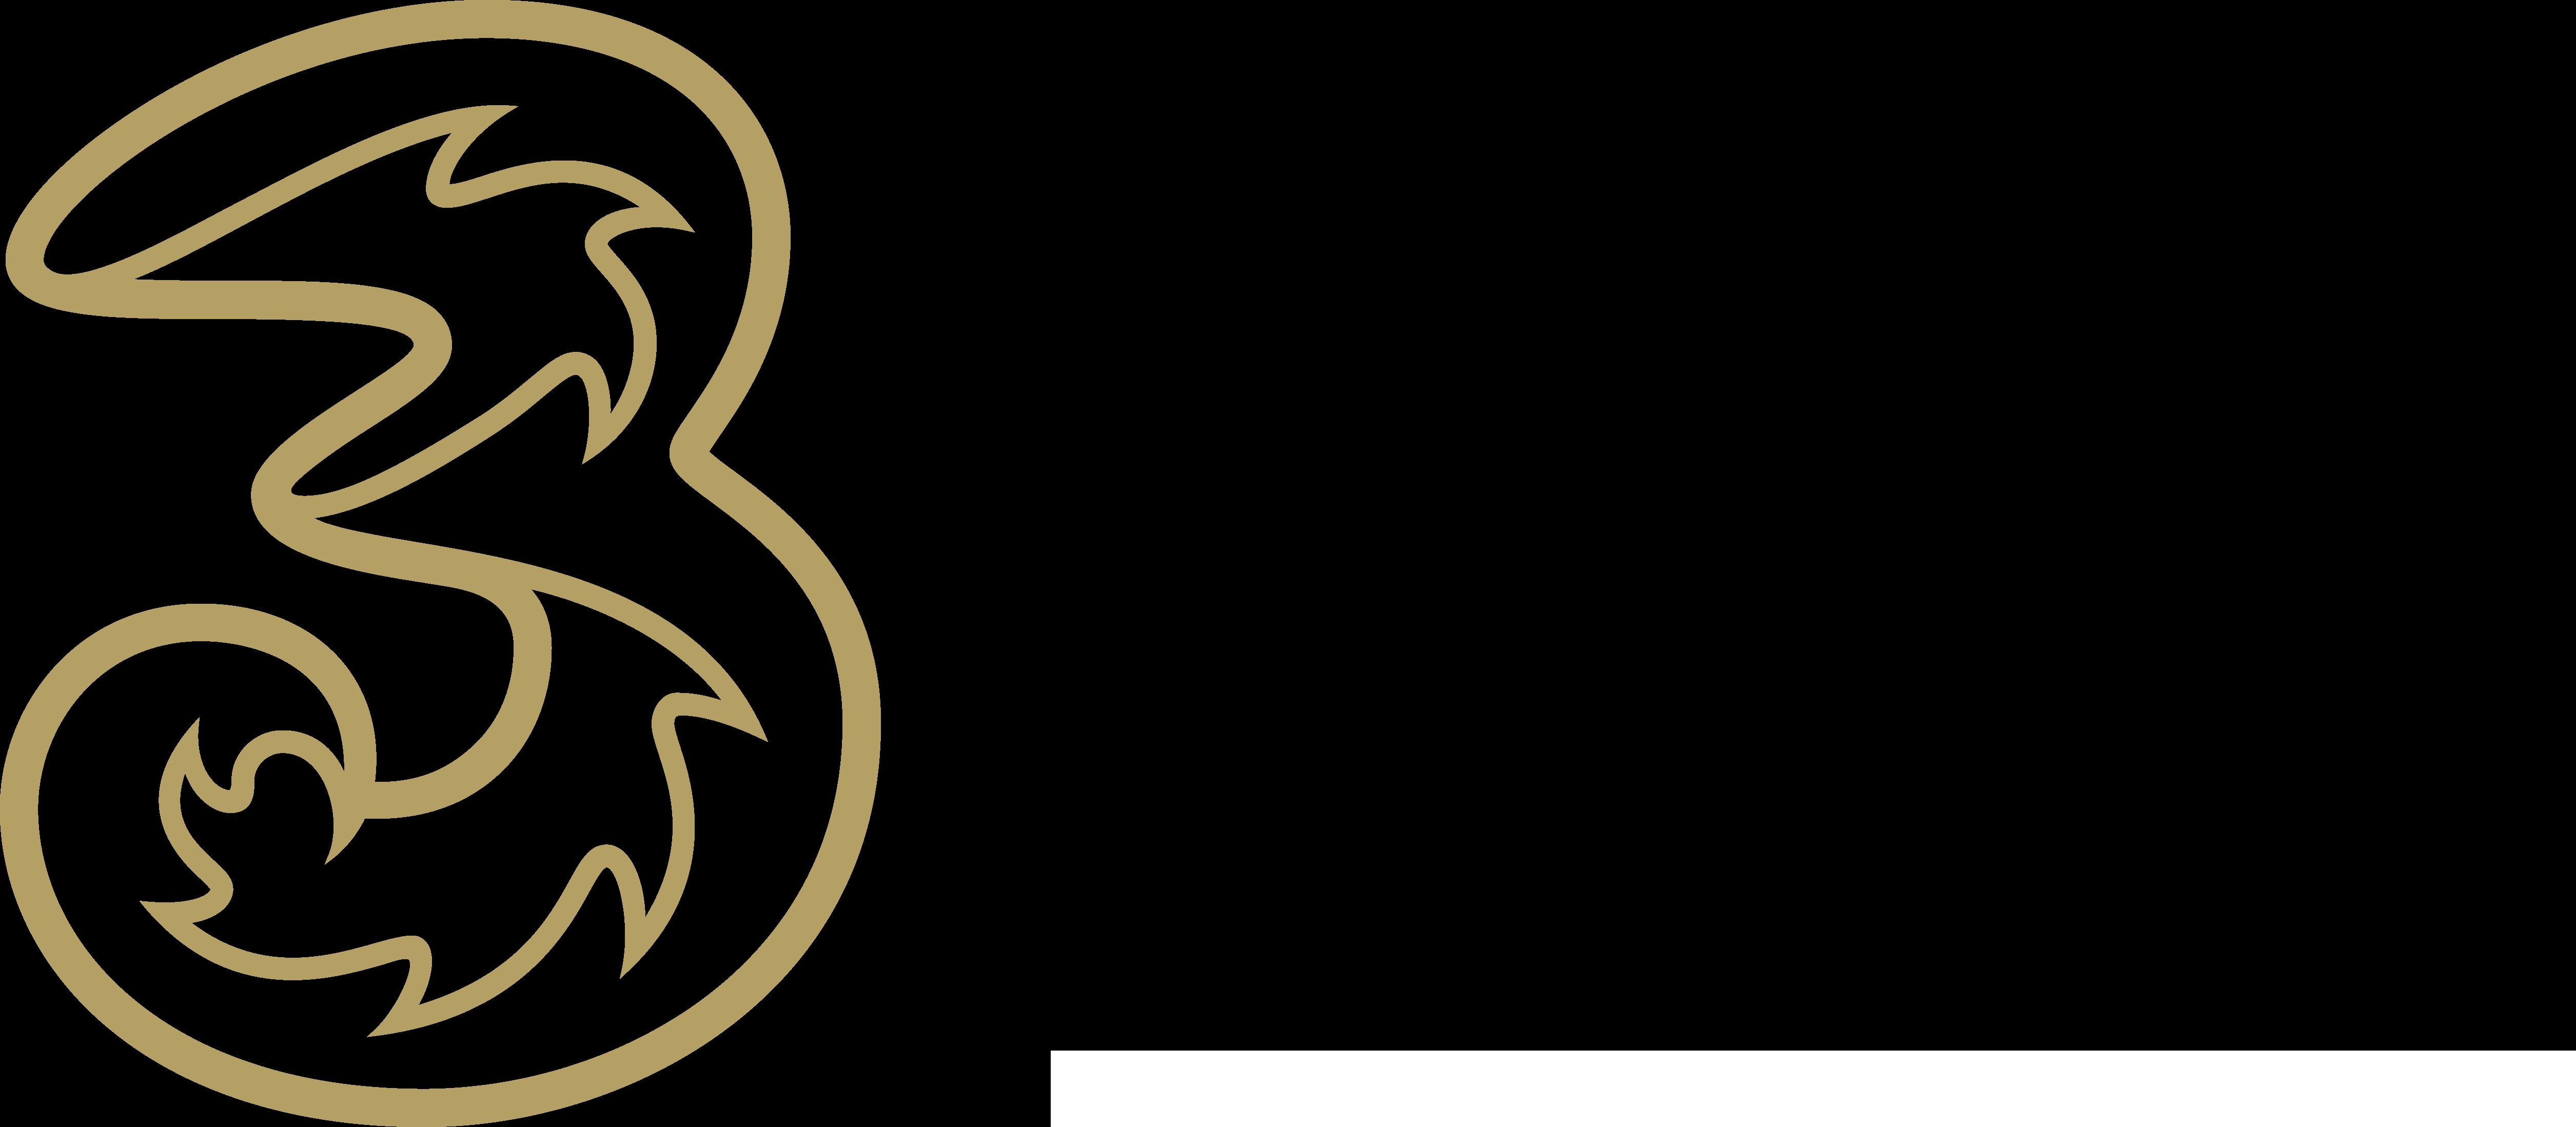 3 Business logo